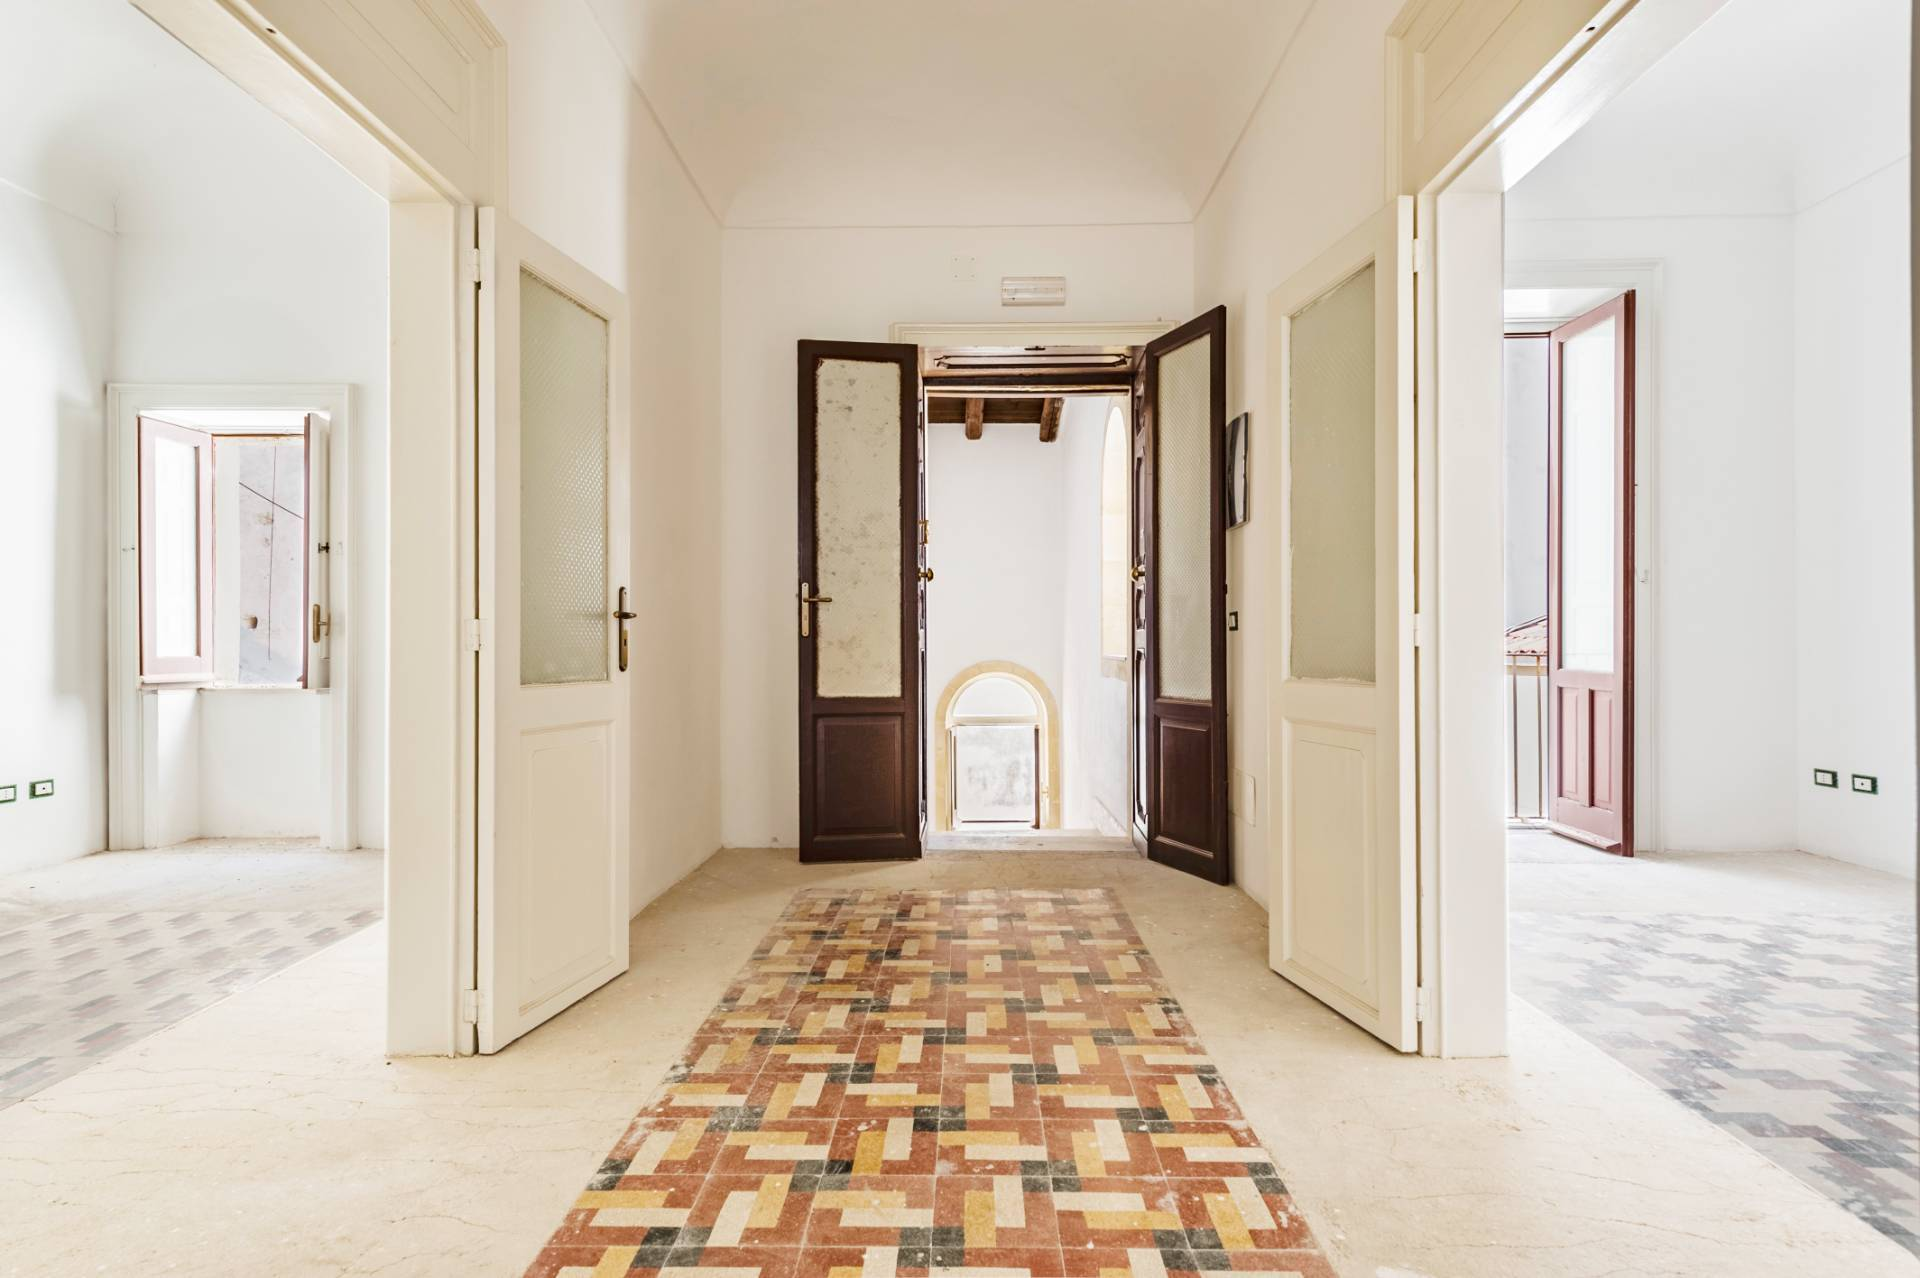 Palazzo in Vendita a Siracusa: 5 locali, 500 mq - Foto 10